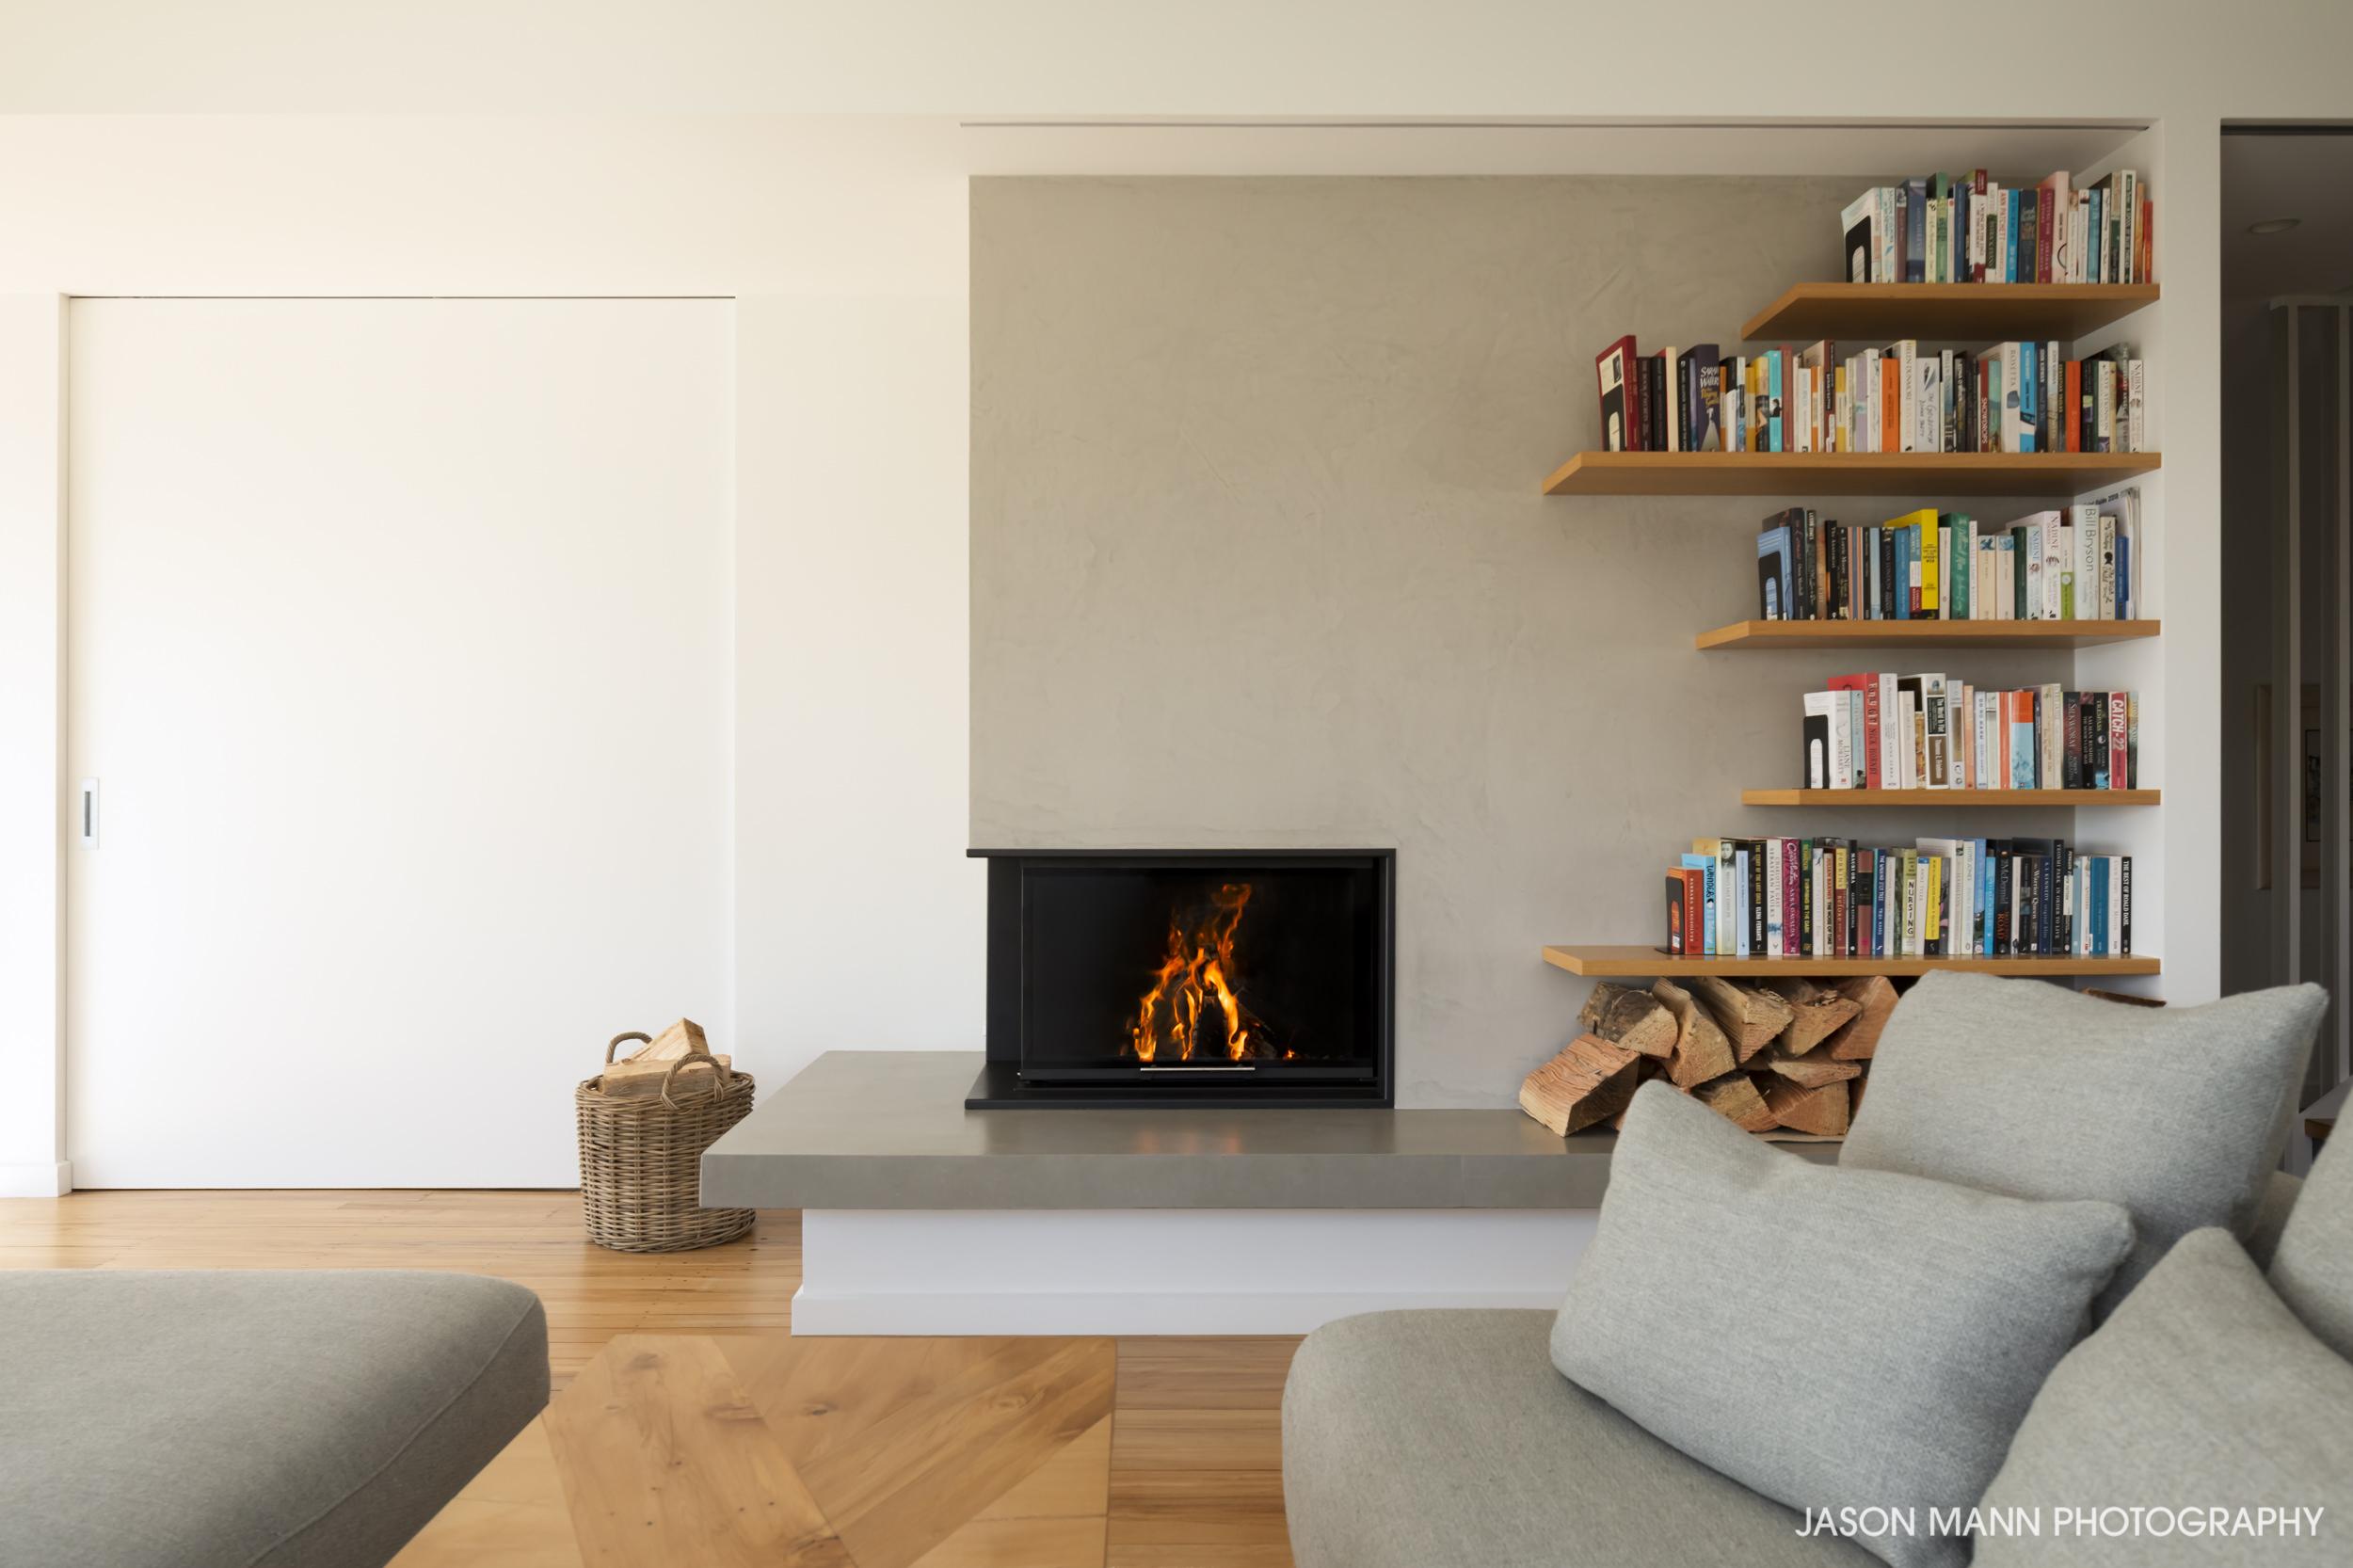 Jason_Mann_Fireplaces_05.jpg